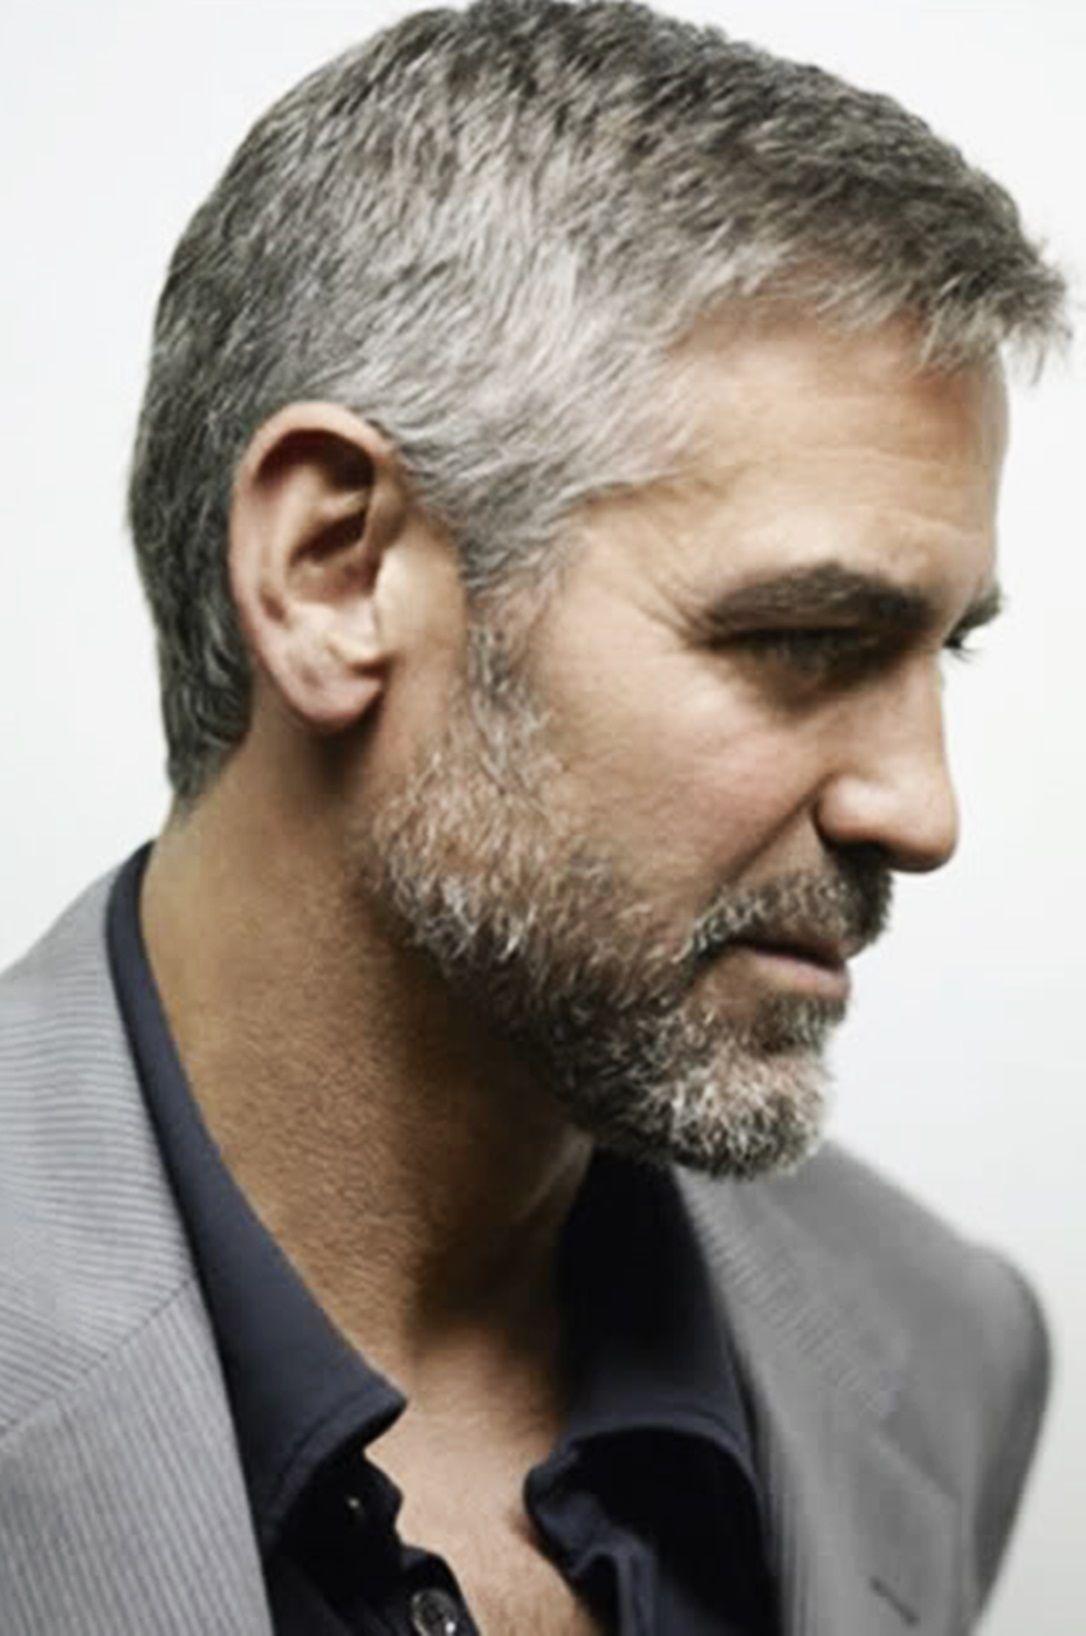 George Clooney Haarstijl Mannen Grijs Haar Mannen Mannenkapsels